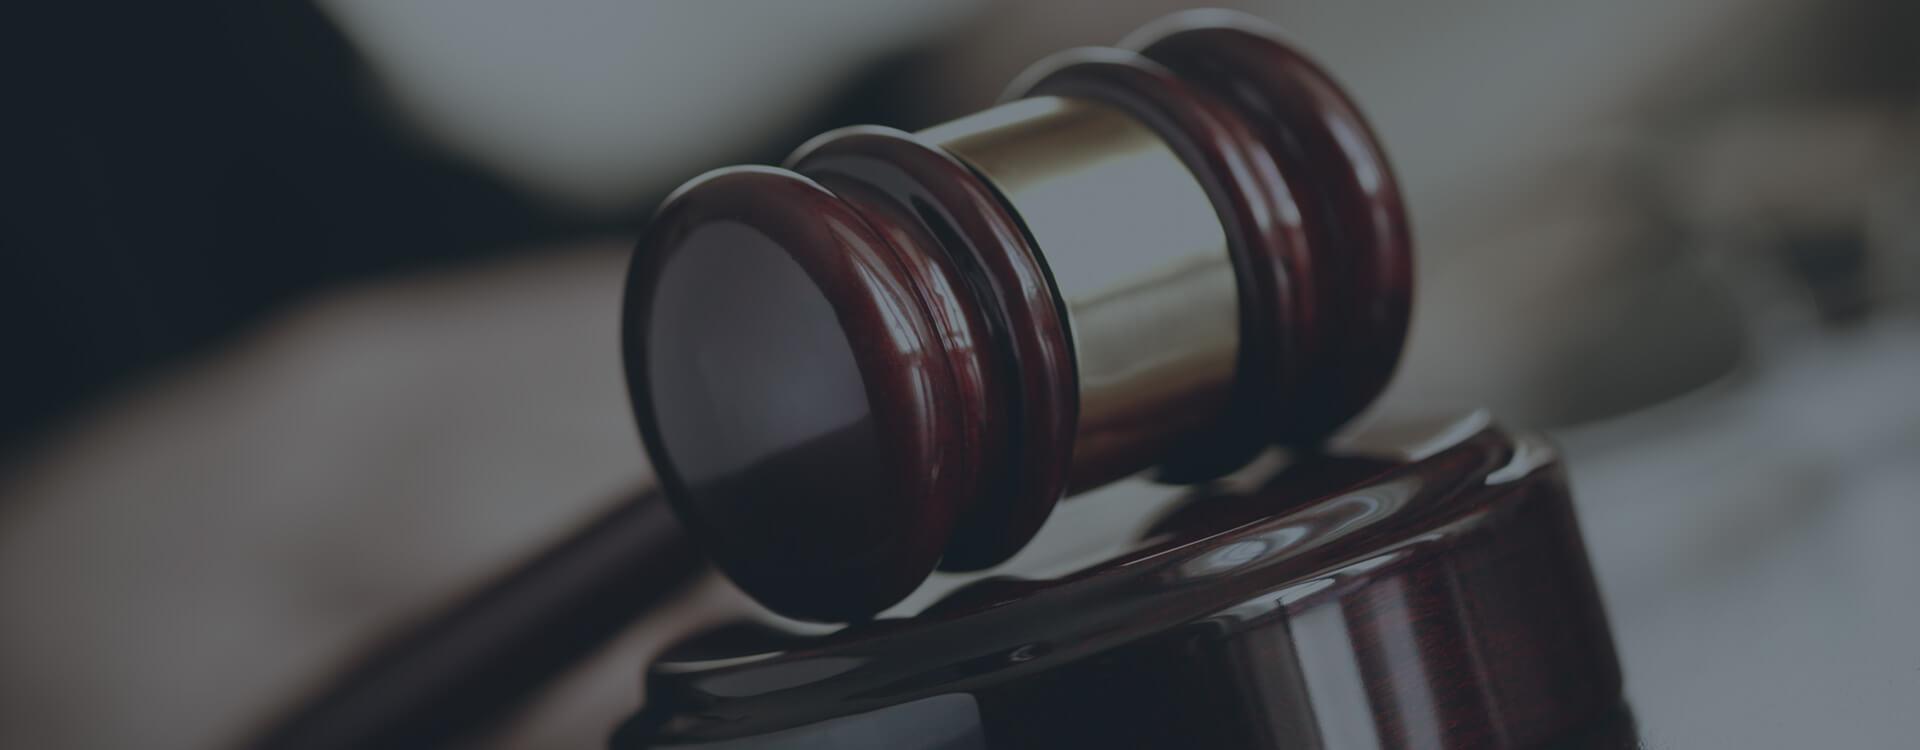 consulenza-legale-studio-pepoli